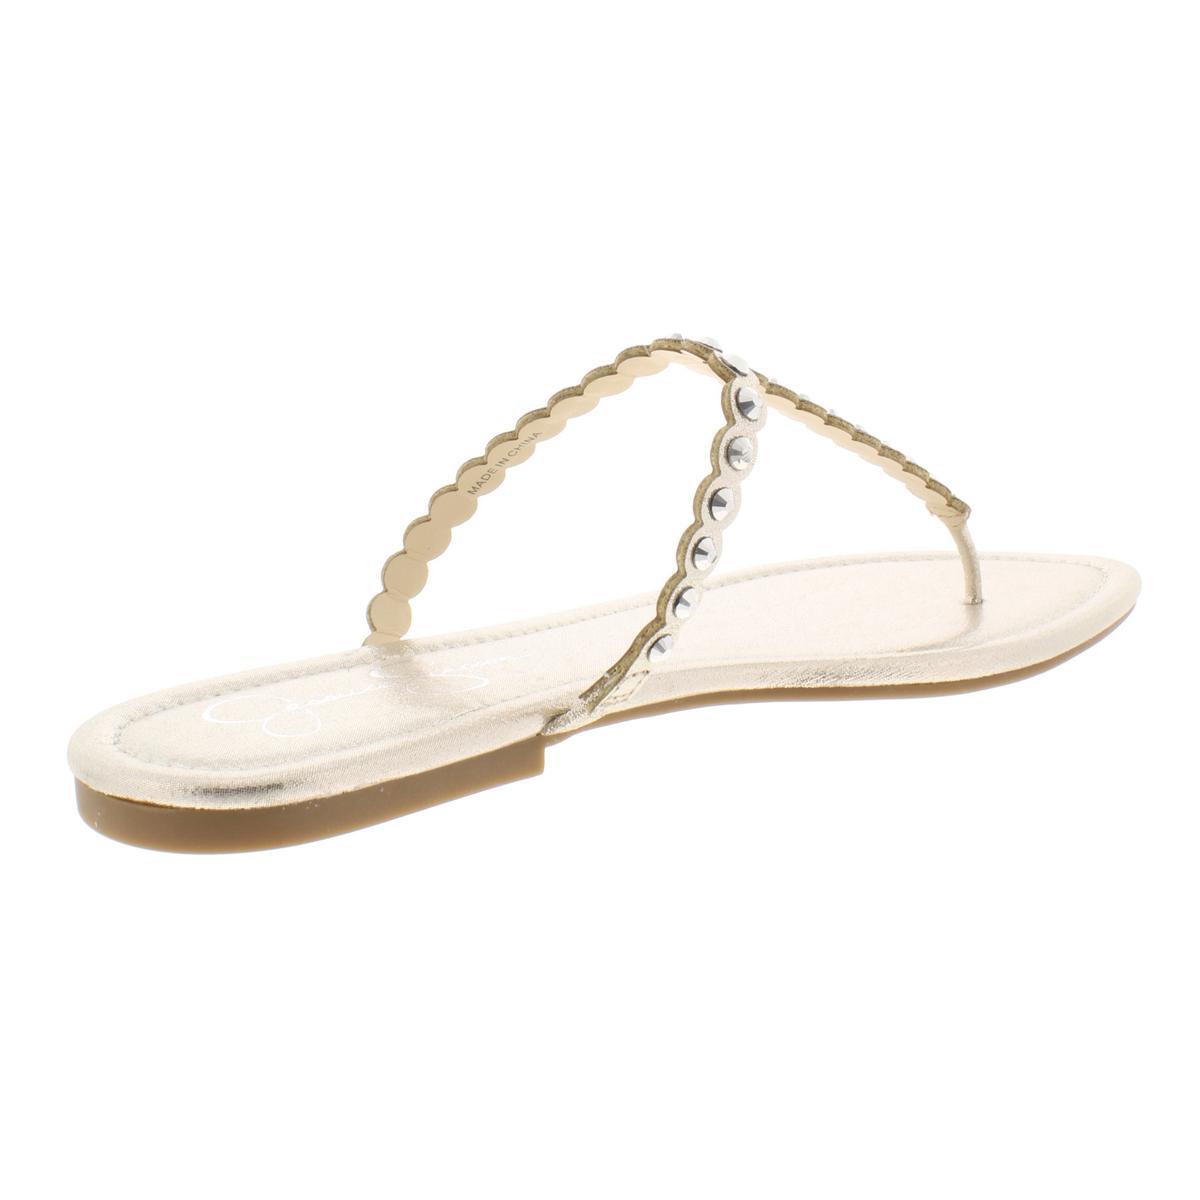 Jessica-Simpson-Womens-Karlee-Metallic-Thong-Studded-Flip-Flops-Flats-BHFO-6739 thumbnail 6